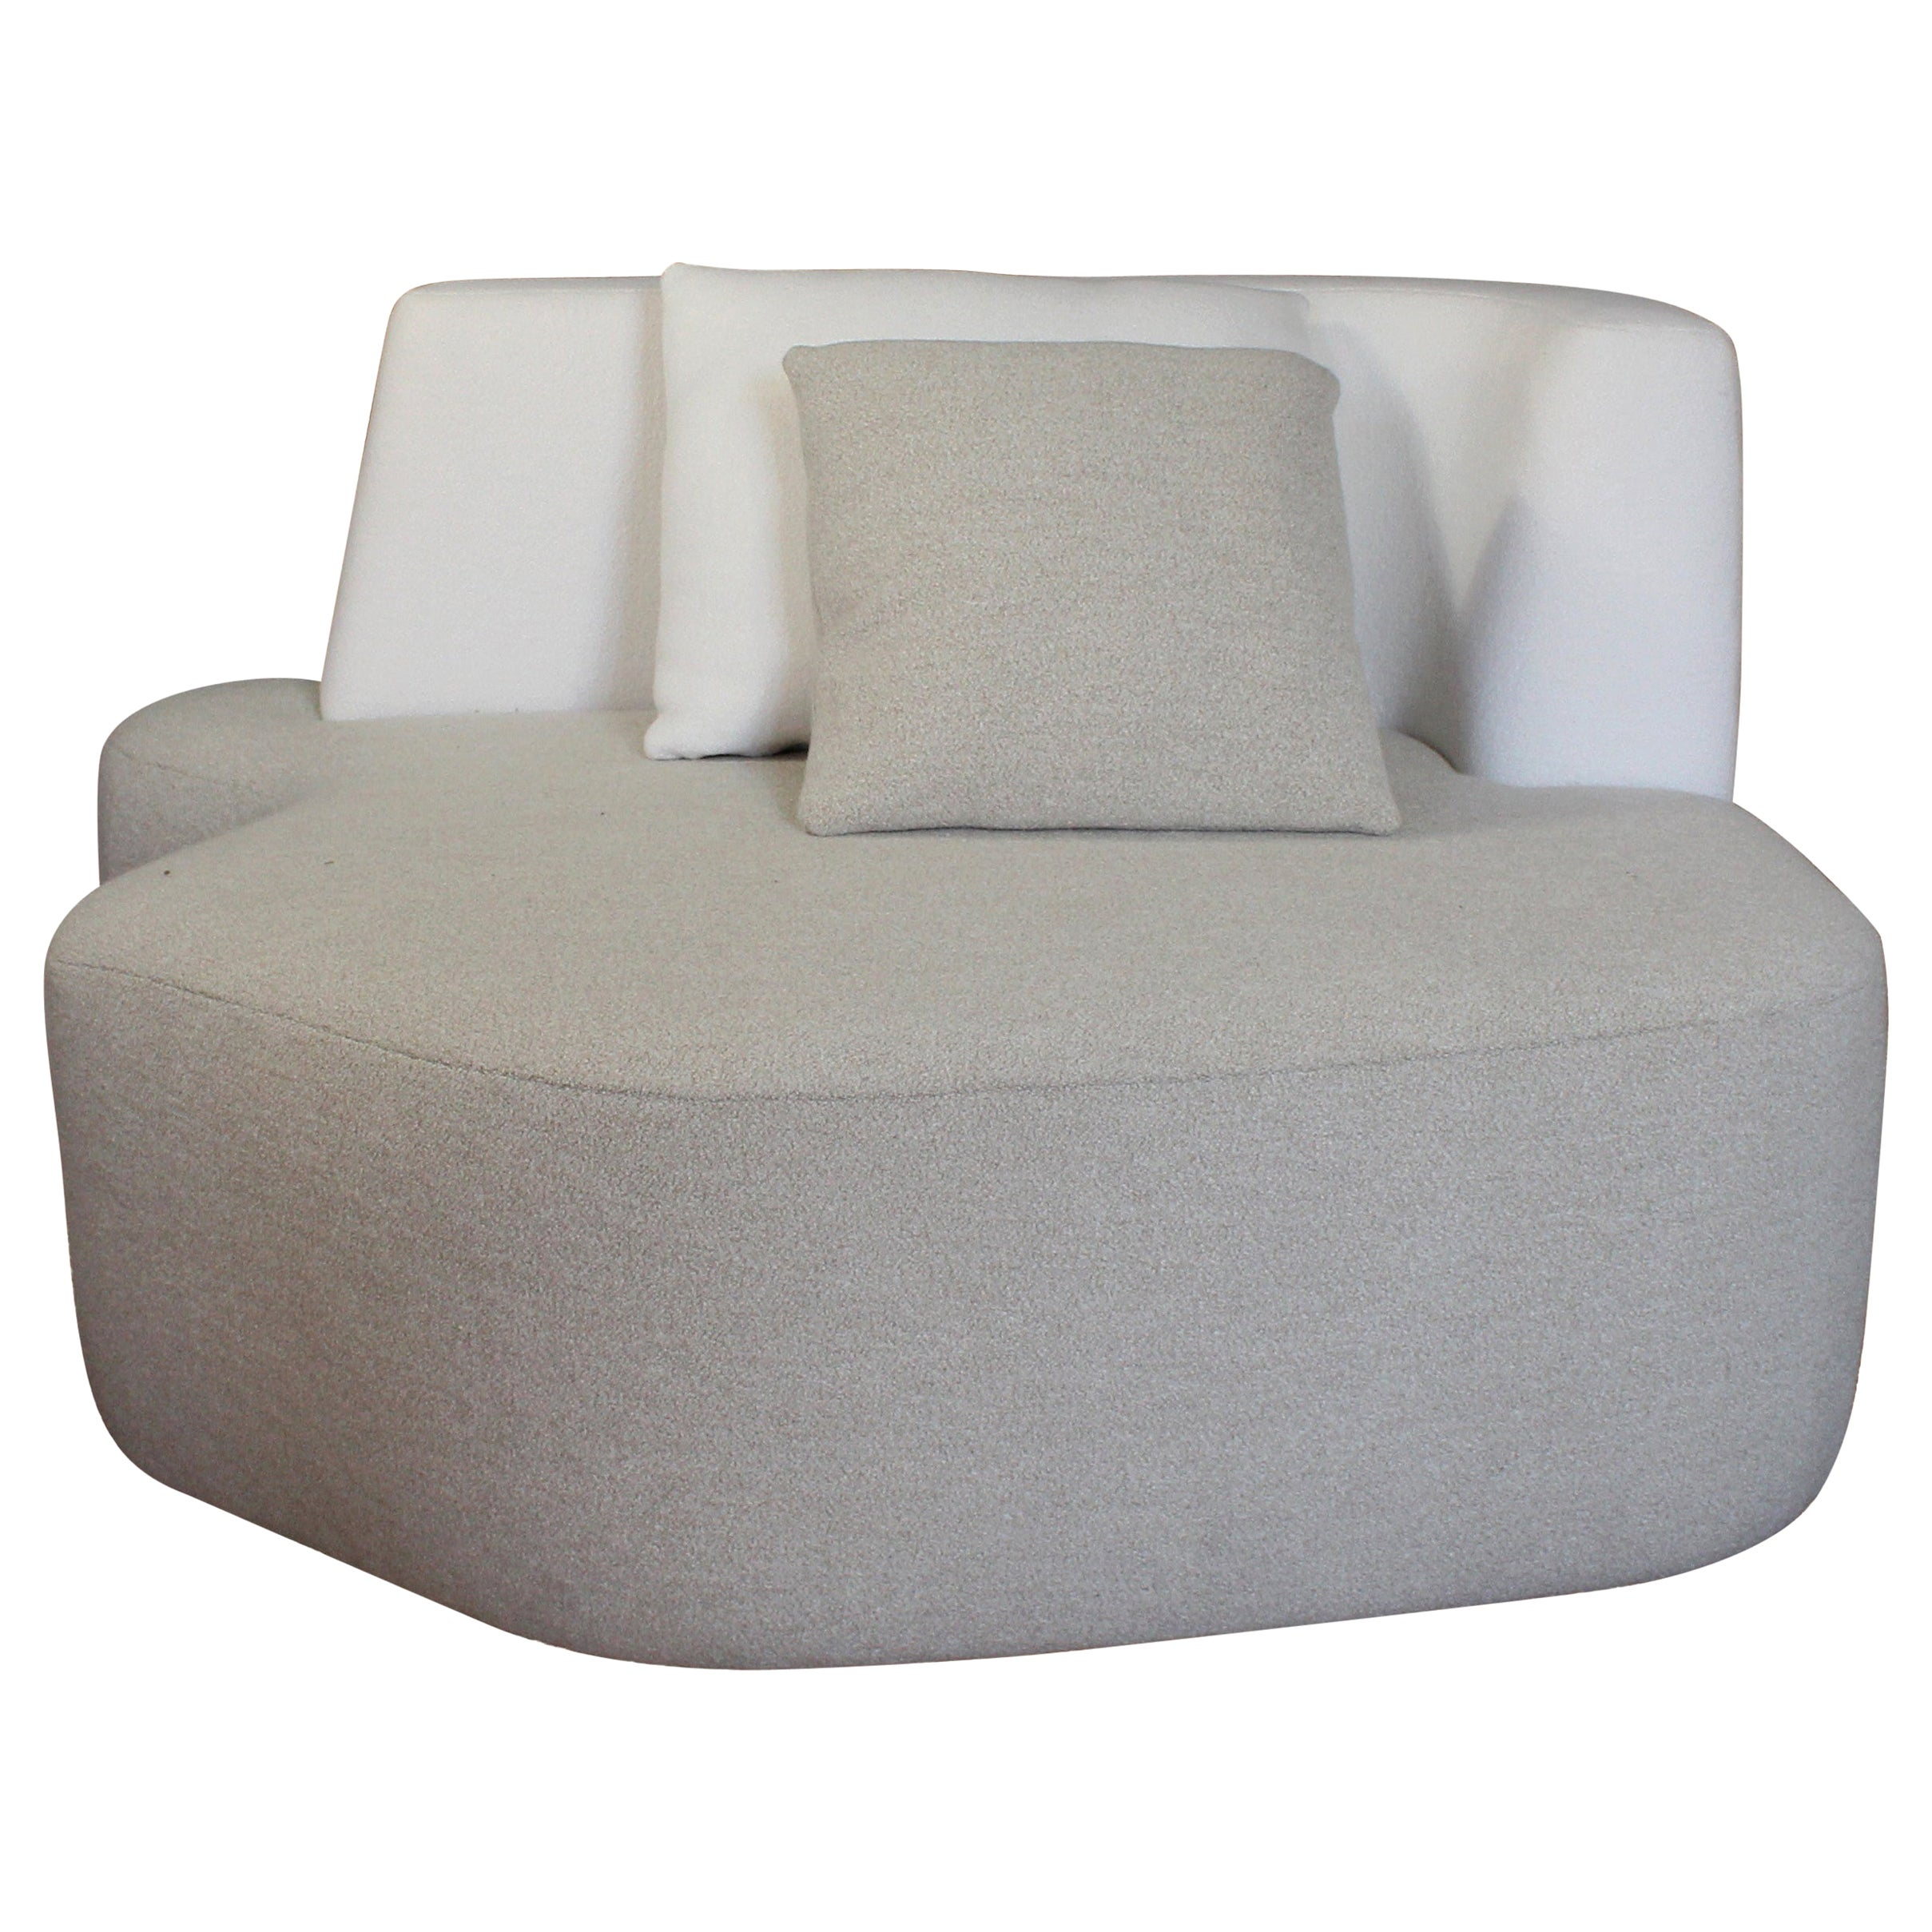 Bespoke Organic Sofa in White and Cream Wool Handmade in France Customizable